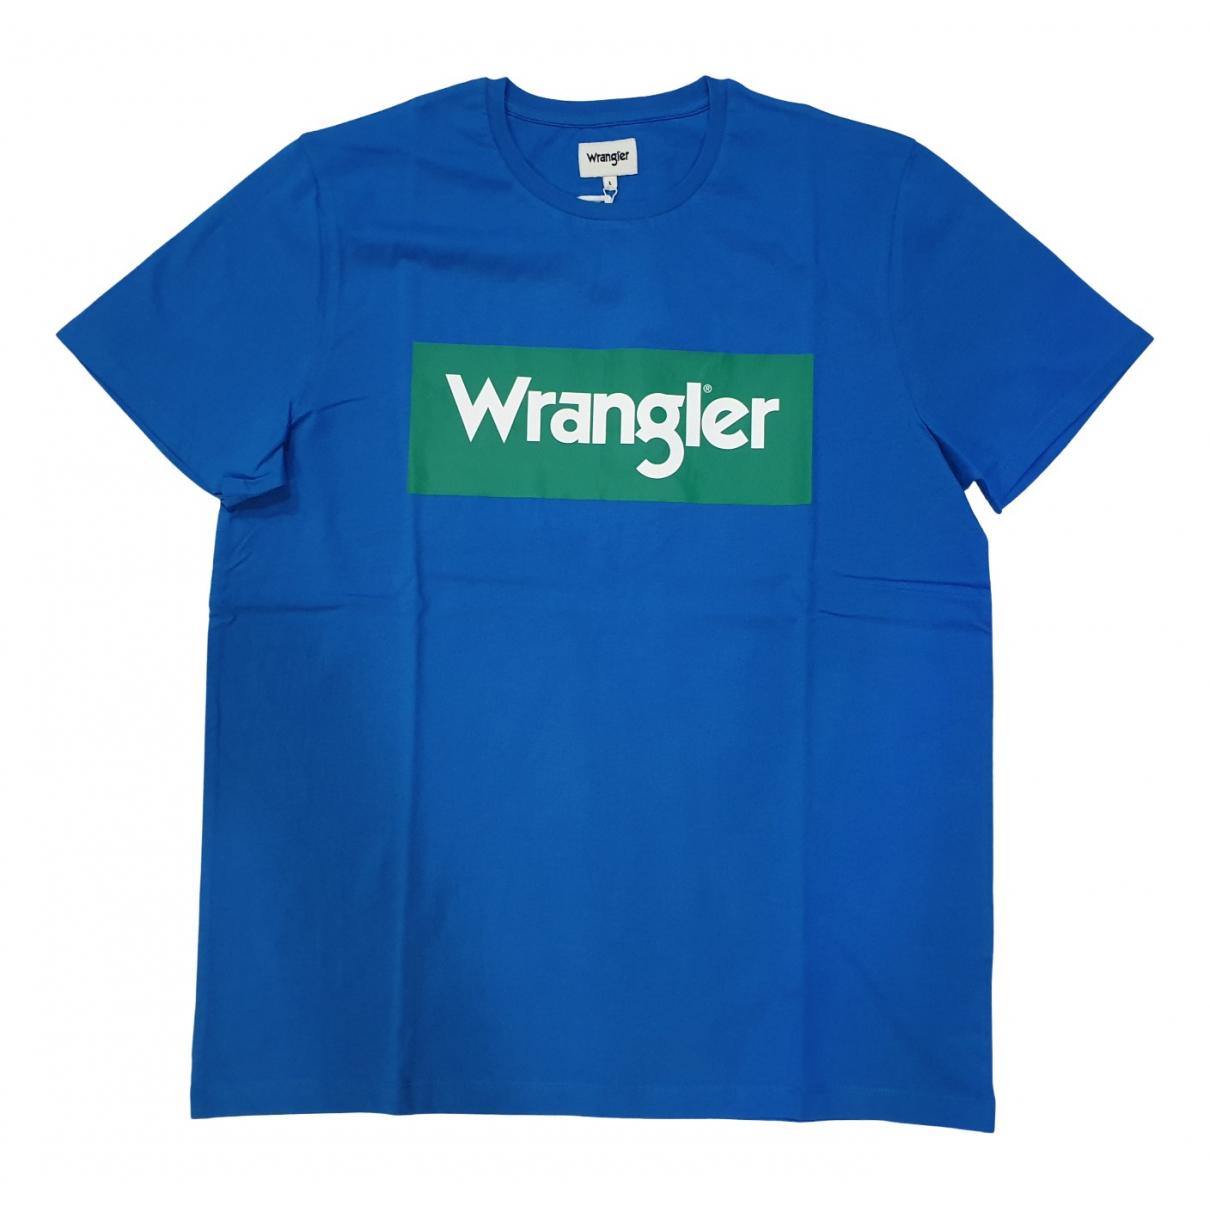 Wrangler N Turquoise Cotton T-shirts for Men L International